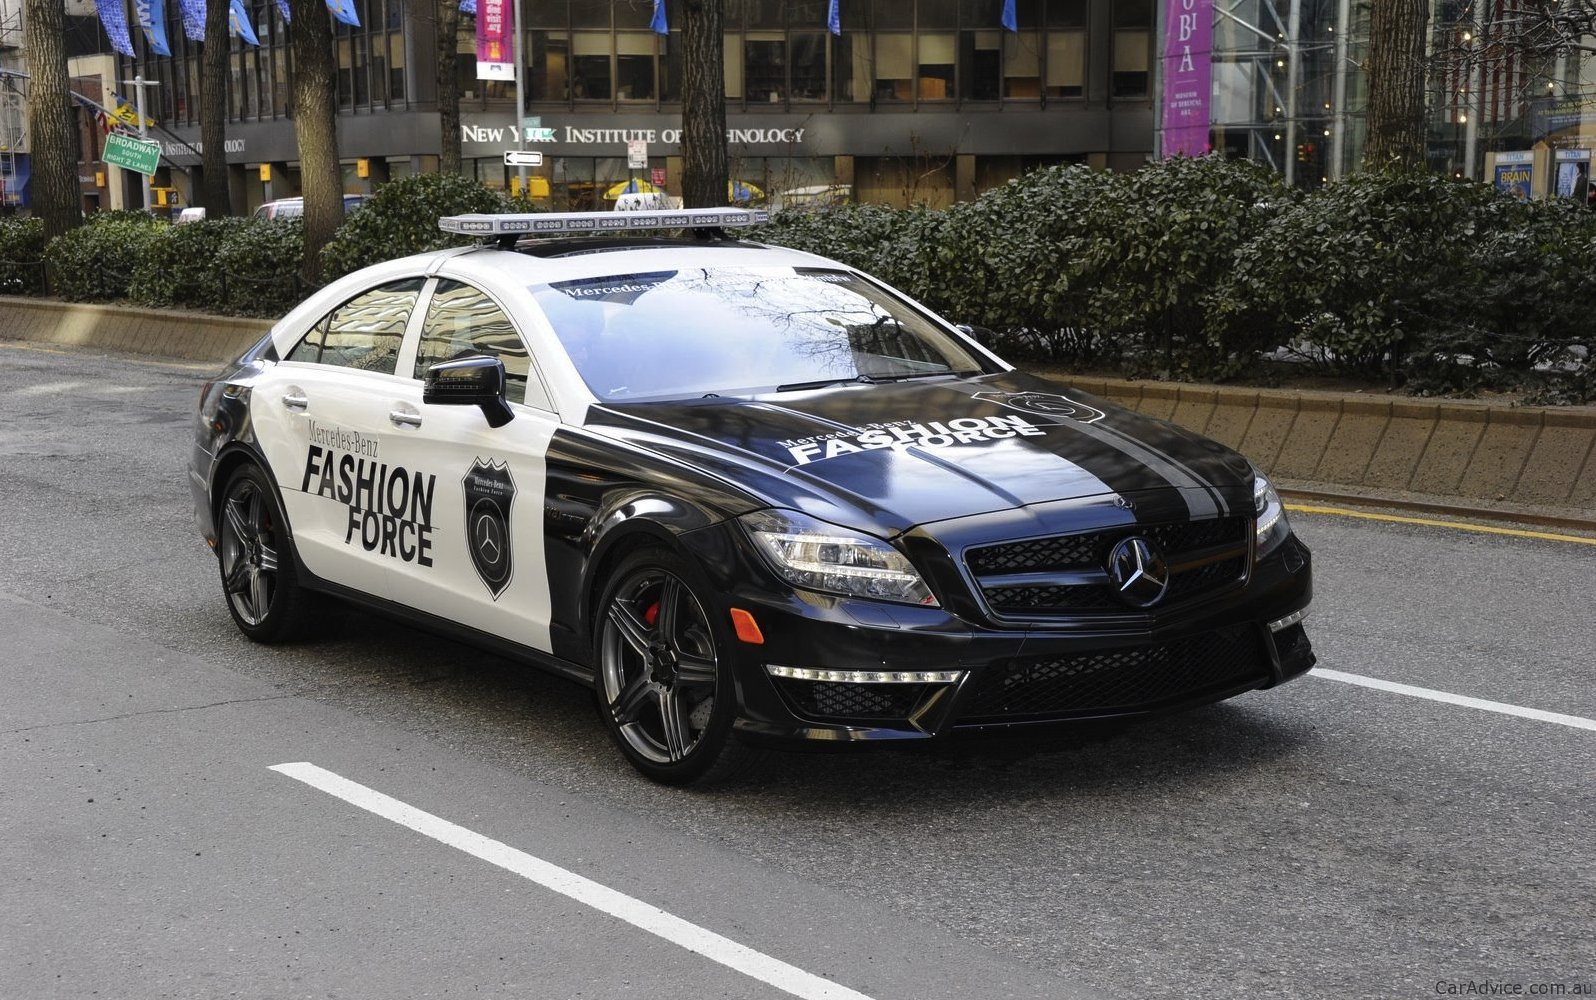 2012 Mercedes Benz Cls63 Fashion Force Patrol Car Photos